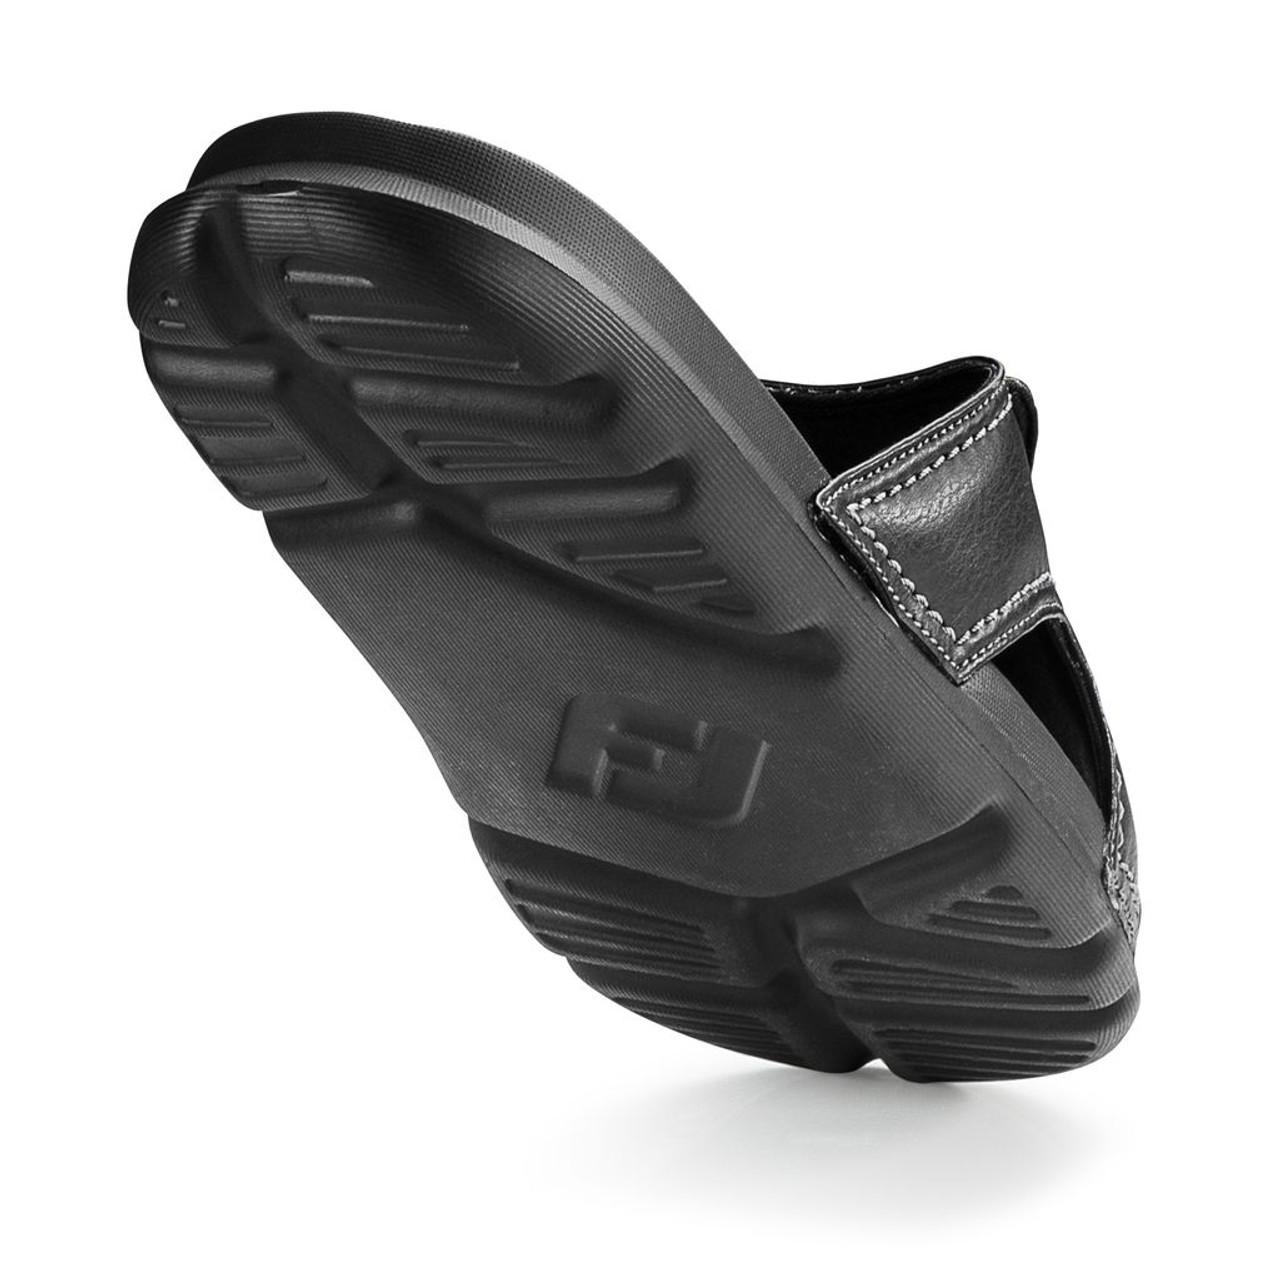 FootJoy FJ Slide - Black / Charcoal (62904)